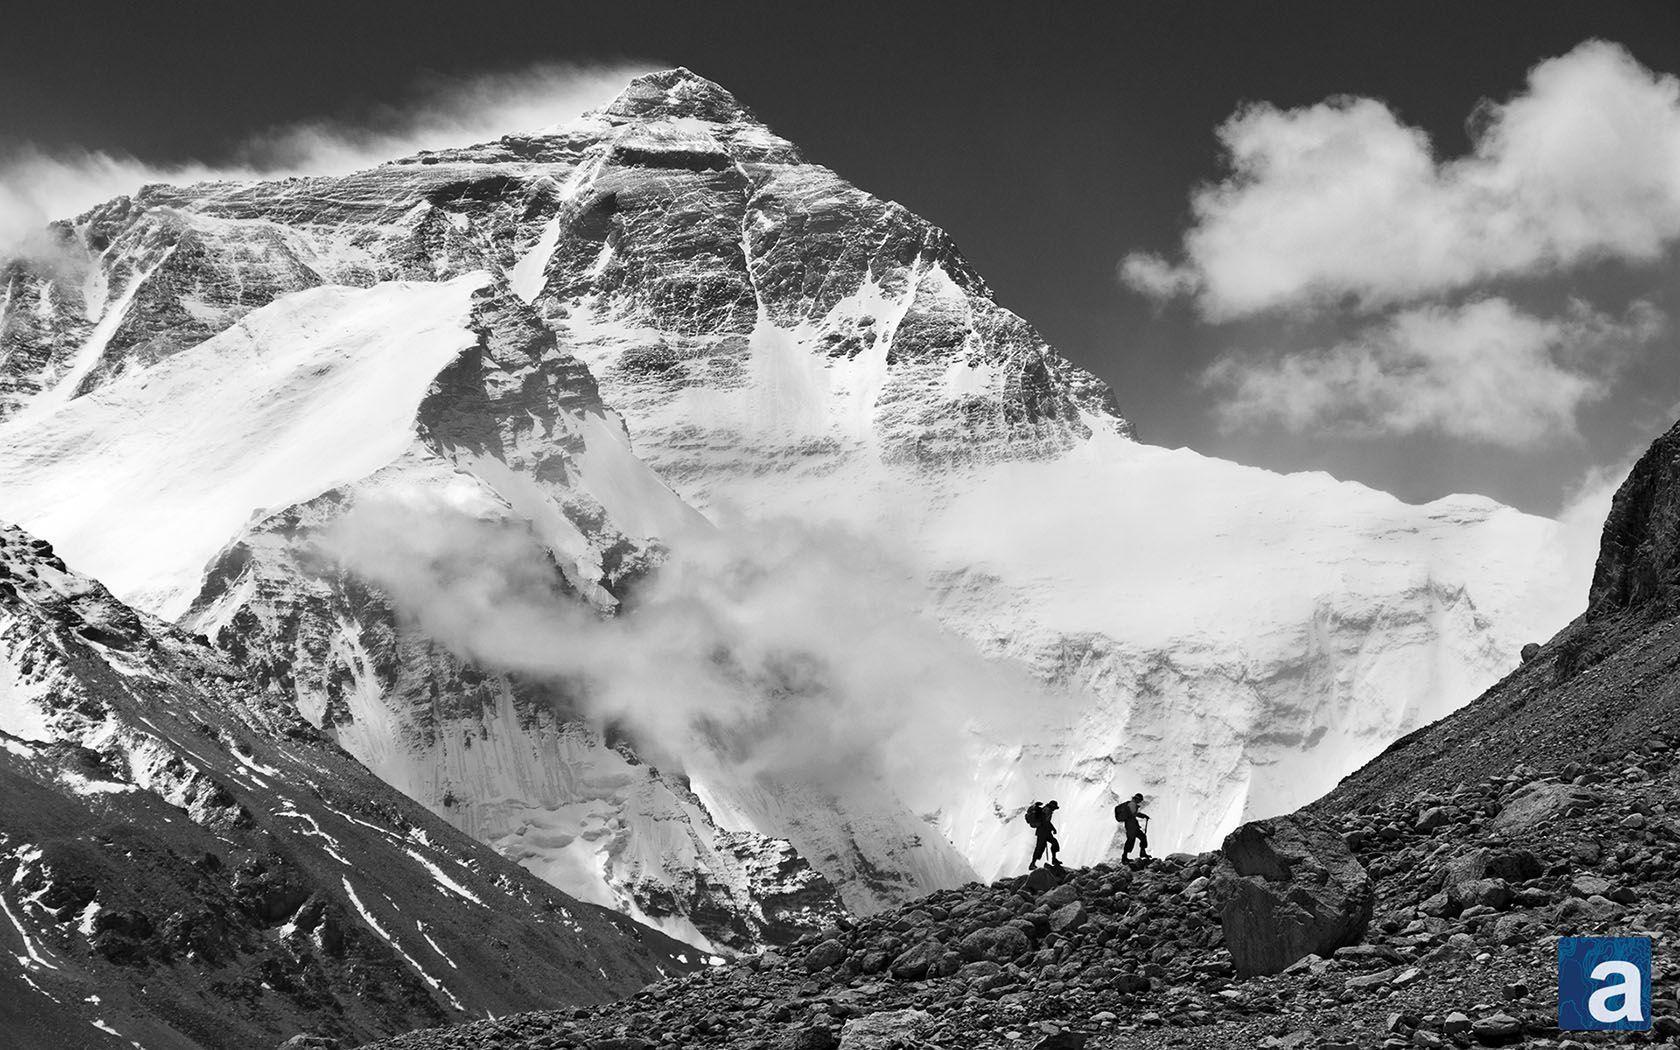 Wallpaper Wednesday: Mt. Everest   adventure journal